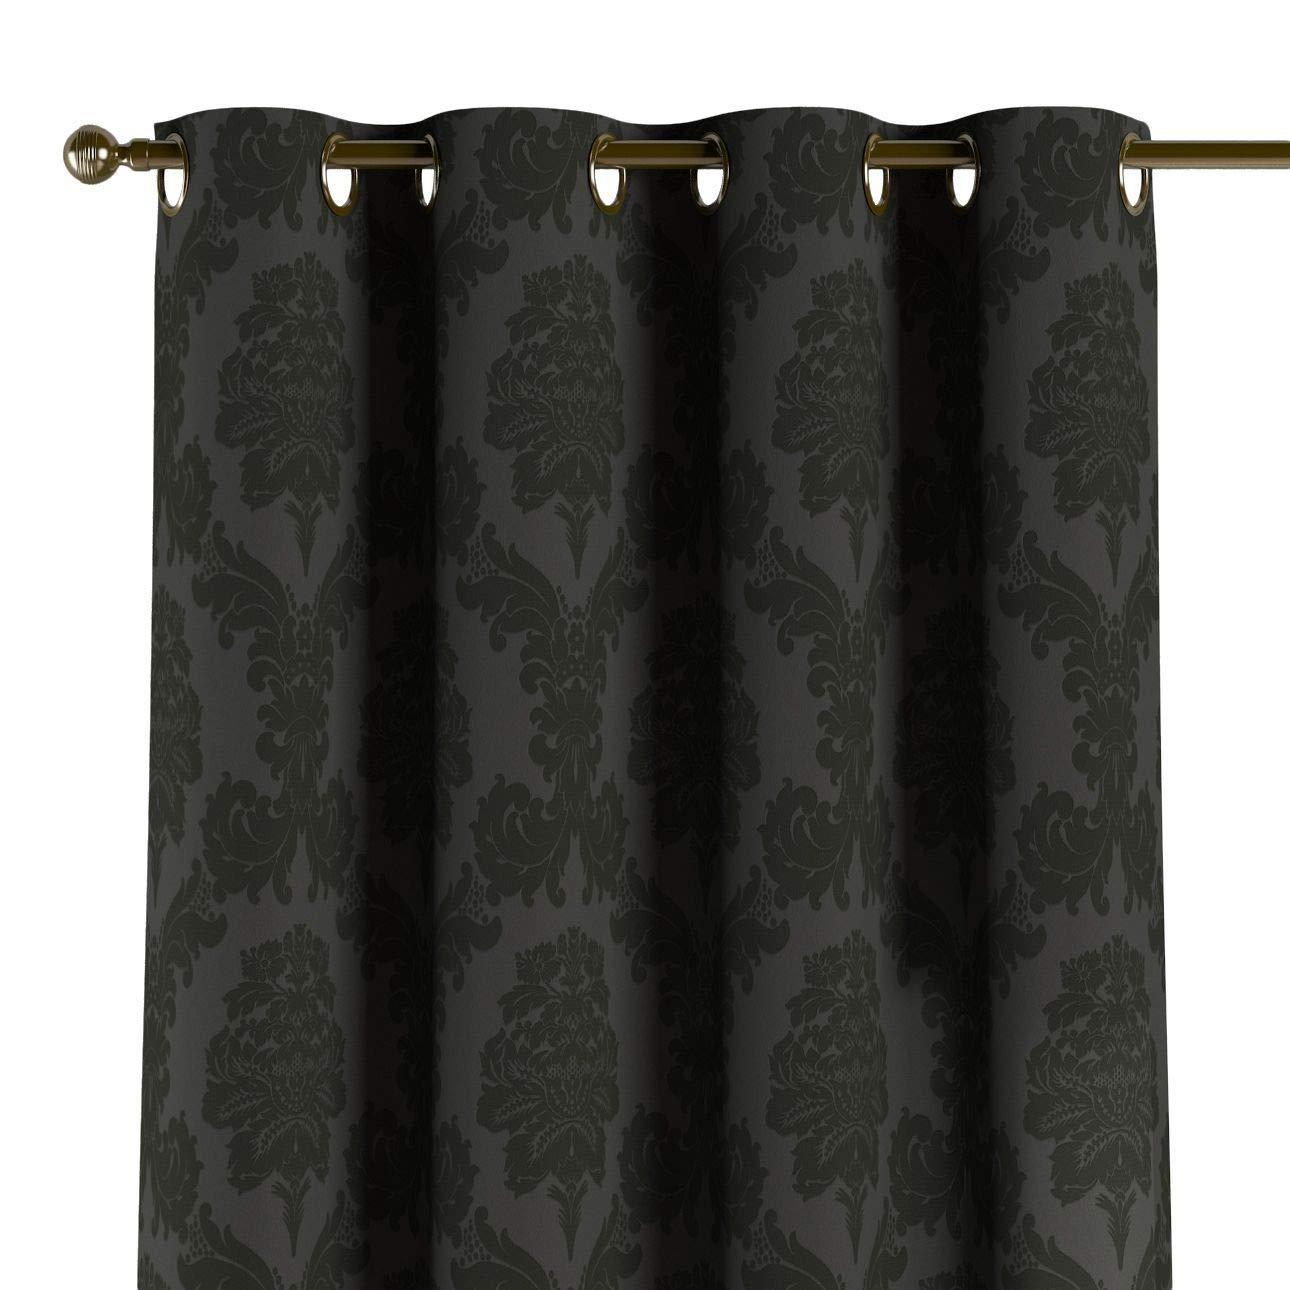 Dekoria Ösenschal Dekoschal Blickdicht 1 Stck. 130 × 260 cm schwarz Maßanfertigung möglich